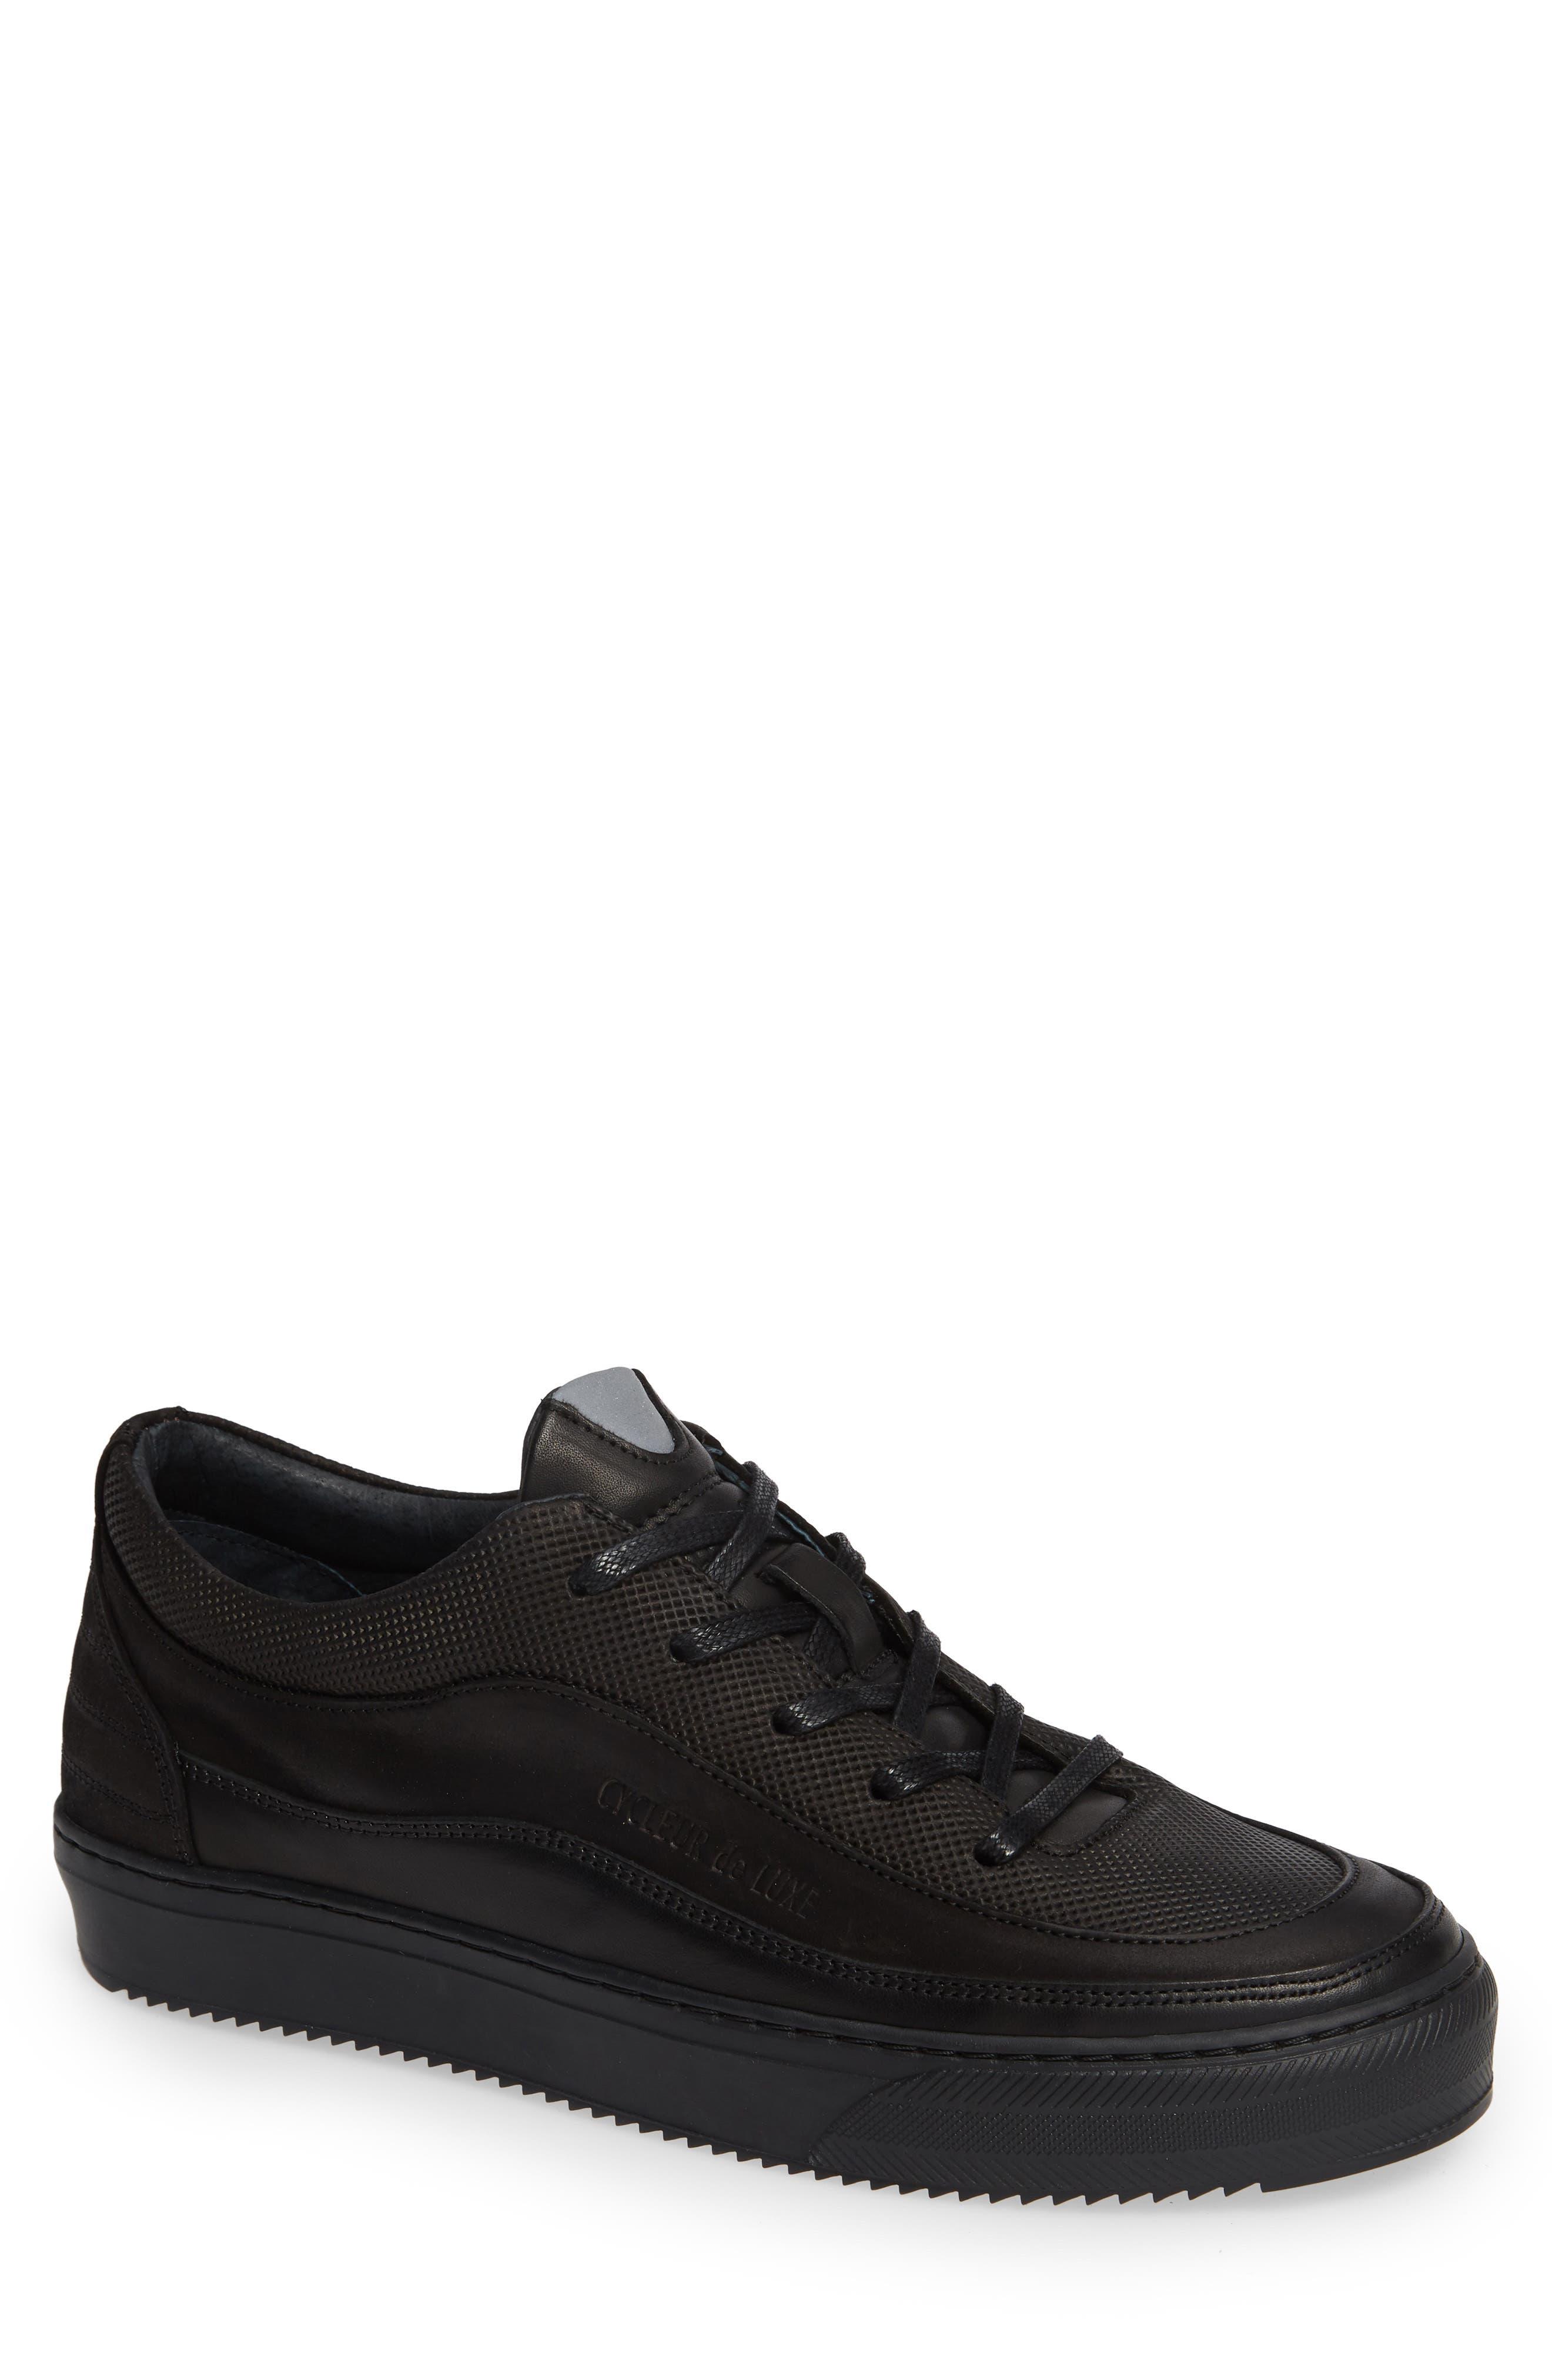 Bullet Sneaker,                             Main thumbnail 1, color,                             BLACK